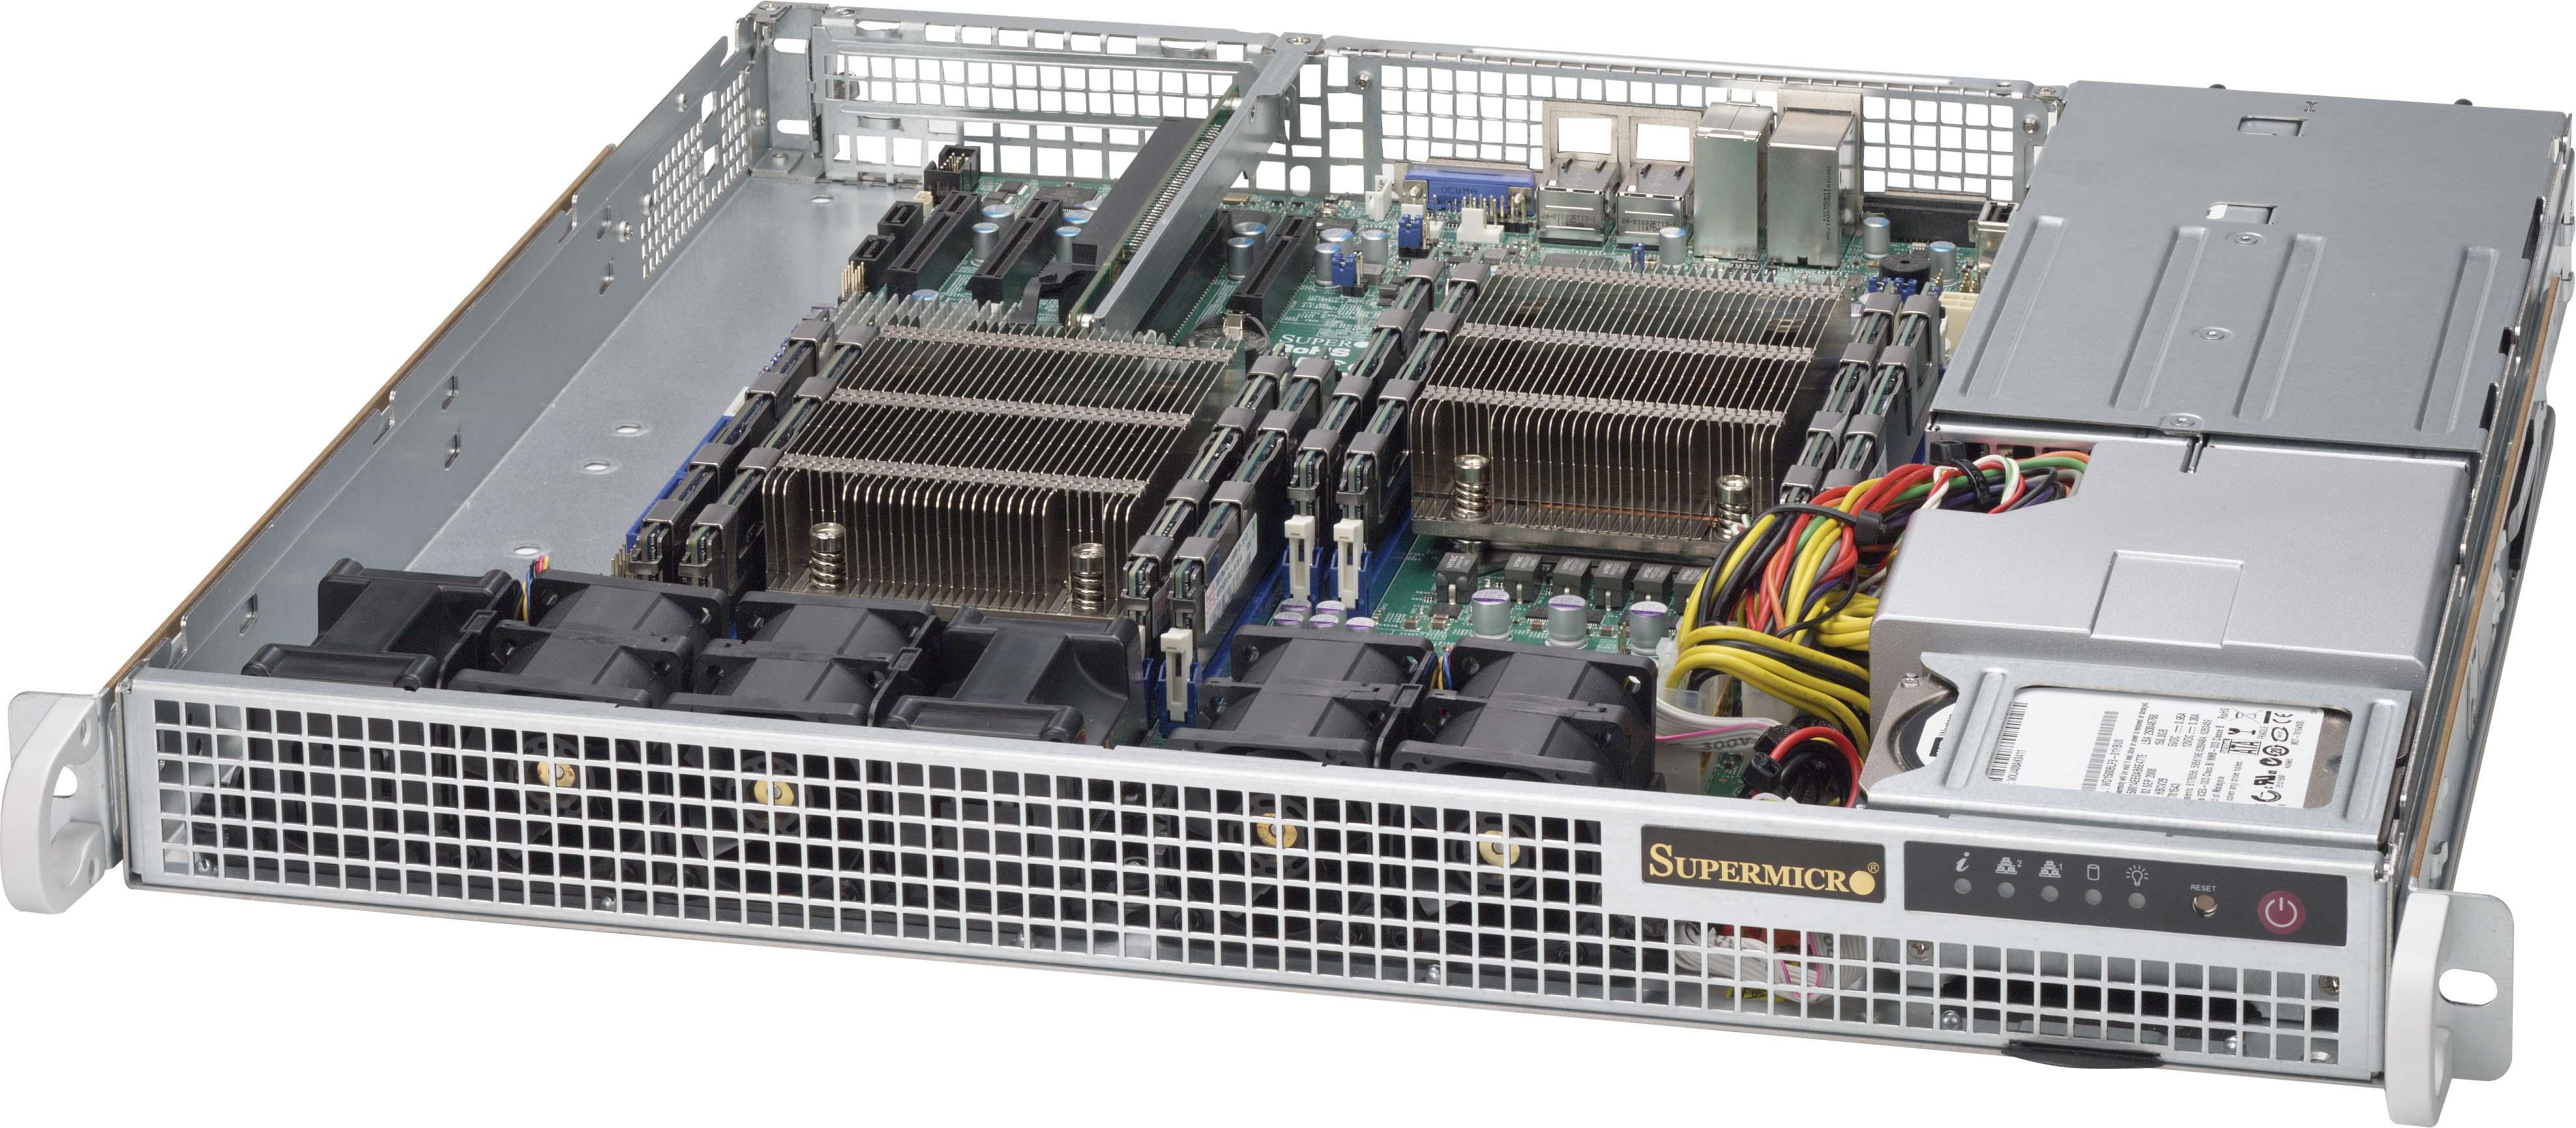 Short Depth Rackmount Servers - Perfect Appliance Servers